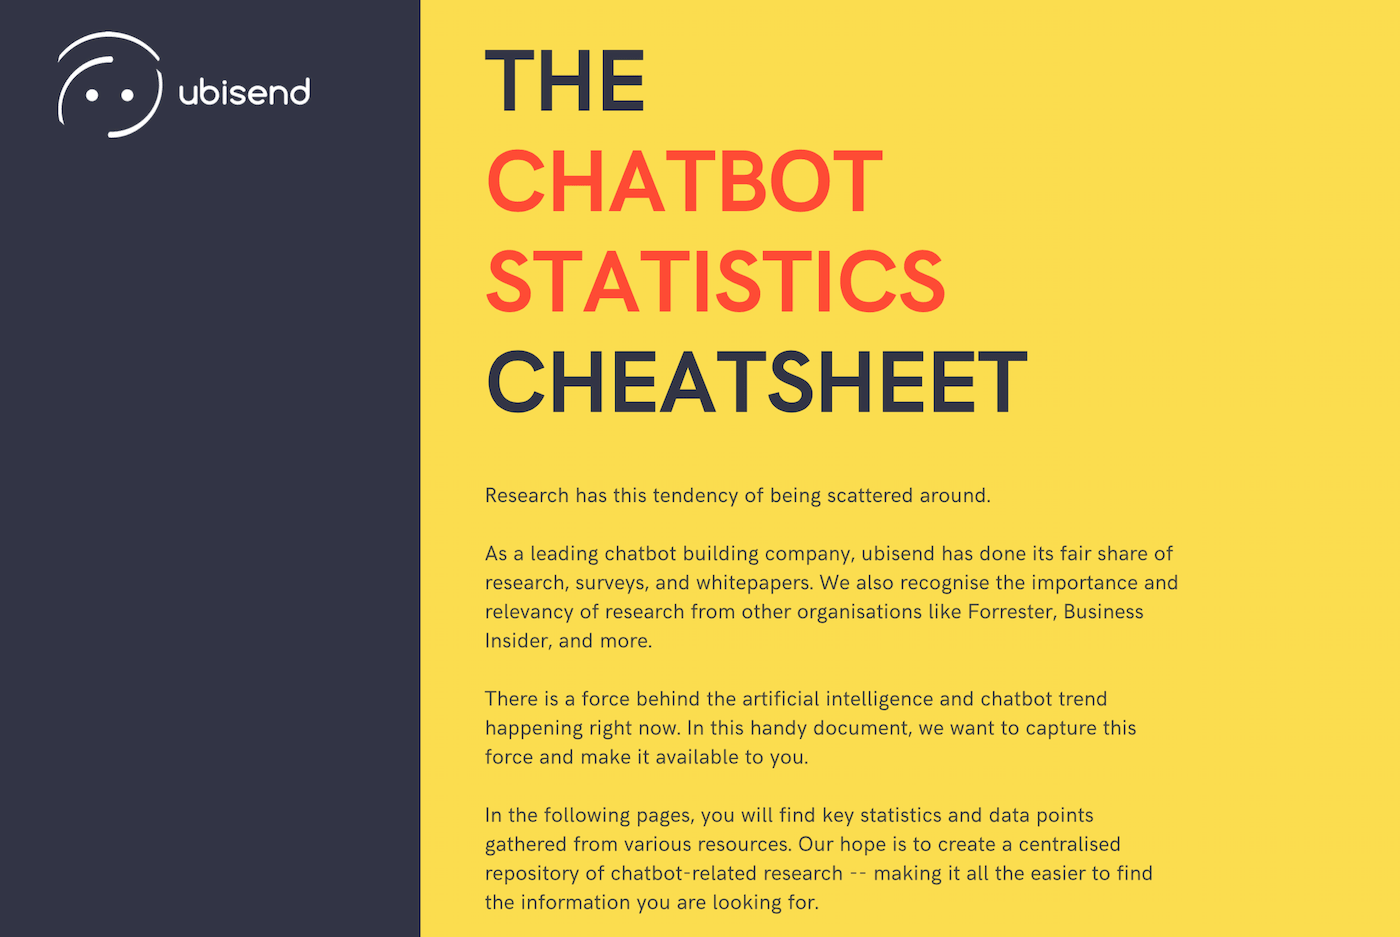 The 2019 Chatbot Statistics Cheatsheet